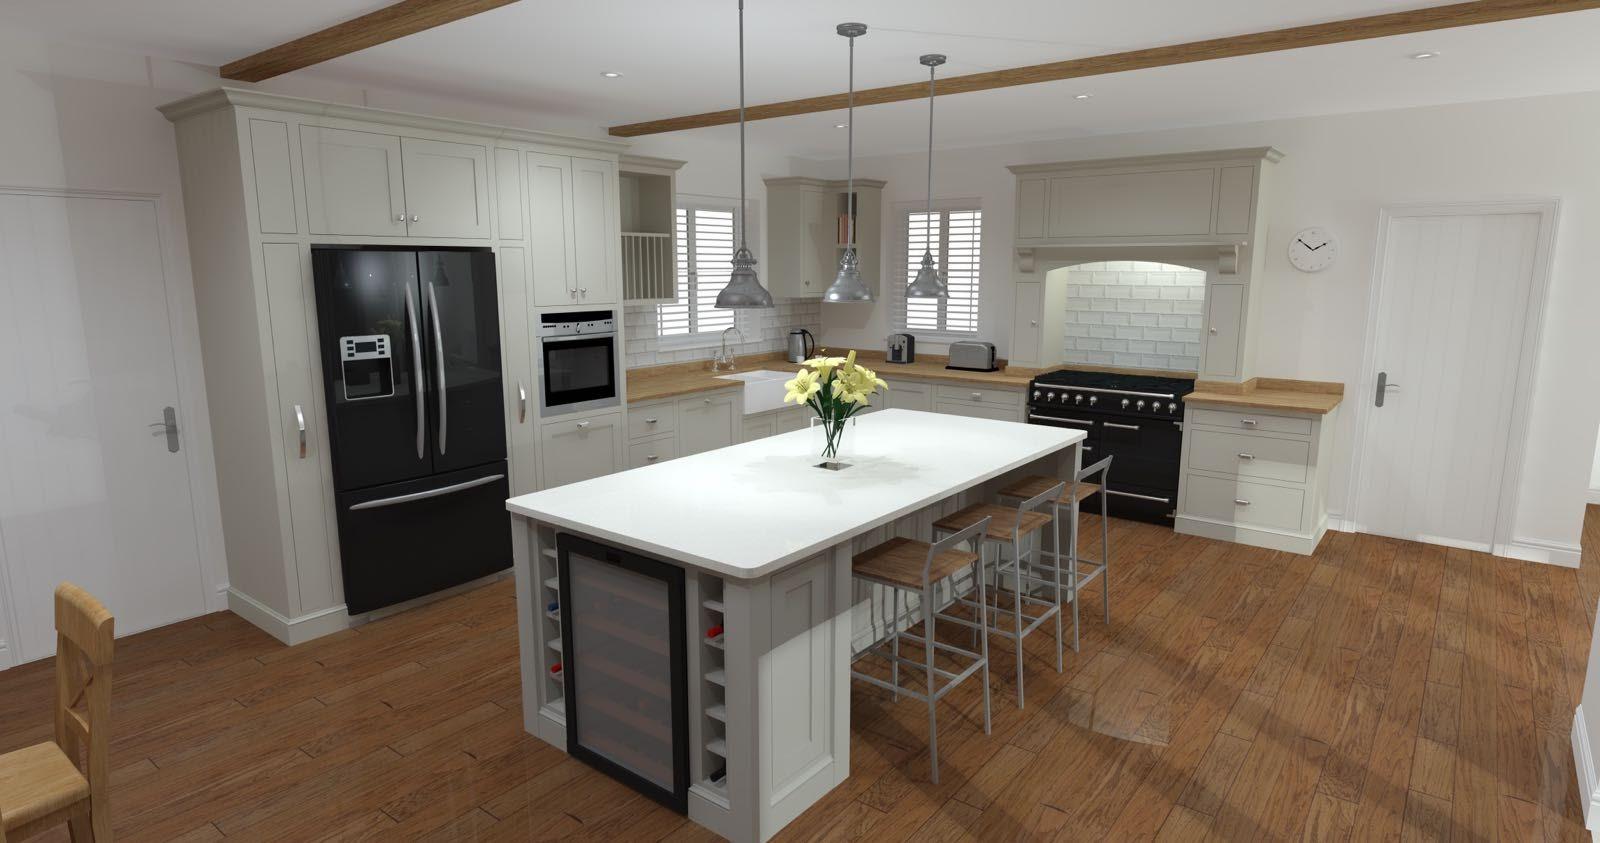 Bespoke kitchen with island